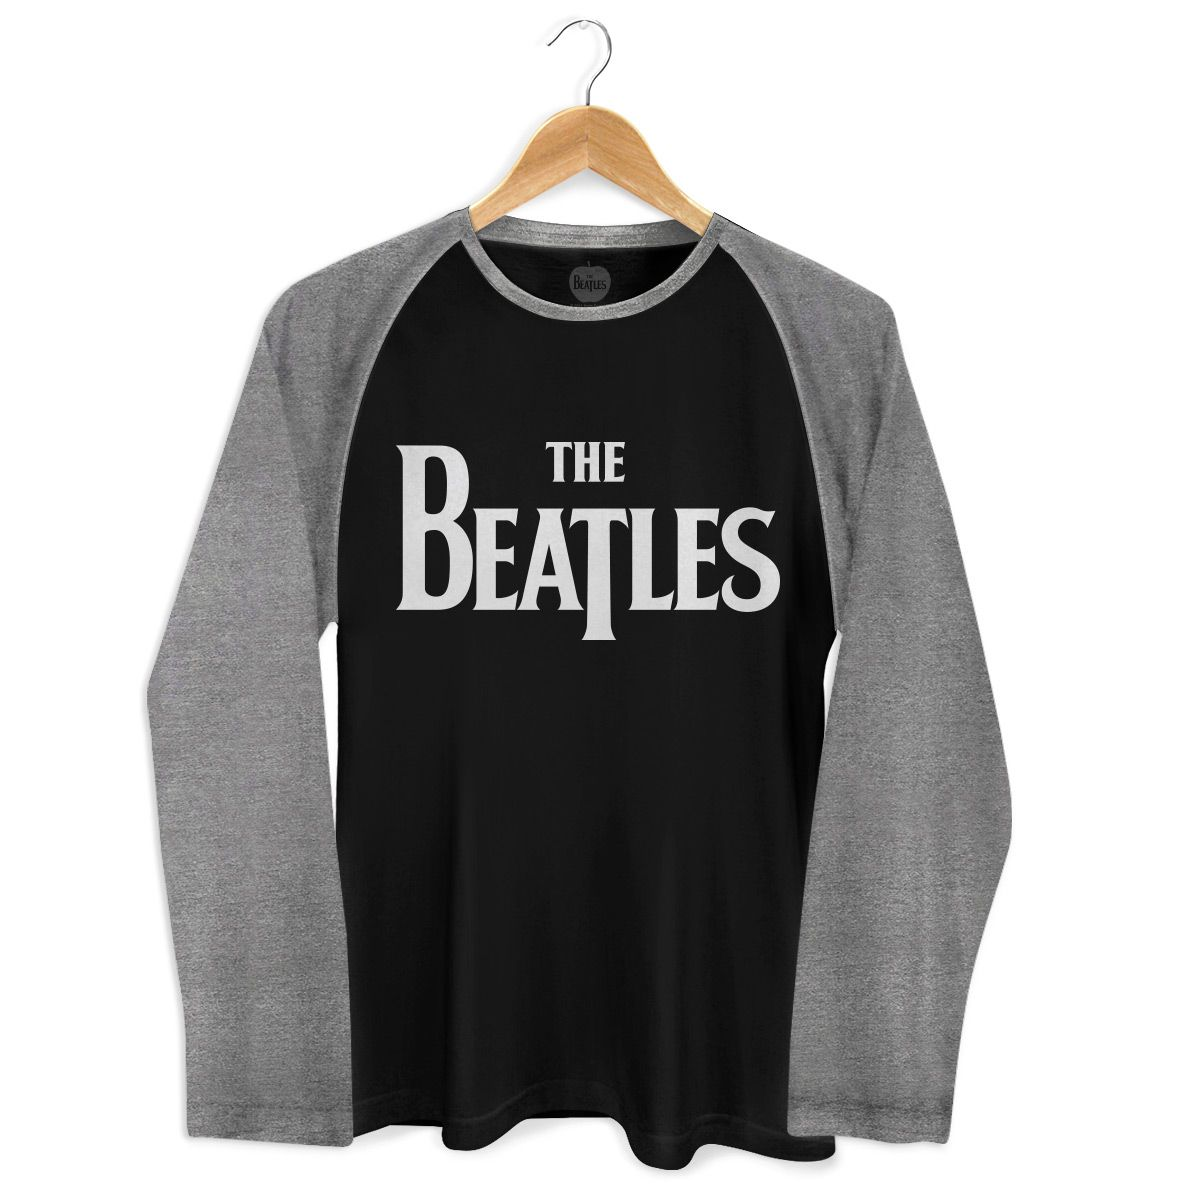 Camiseta Manga Longa Raglan Masculina The Beatles Classic Logo Negative